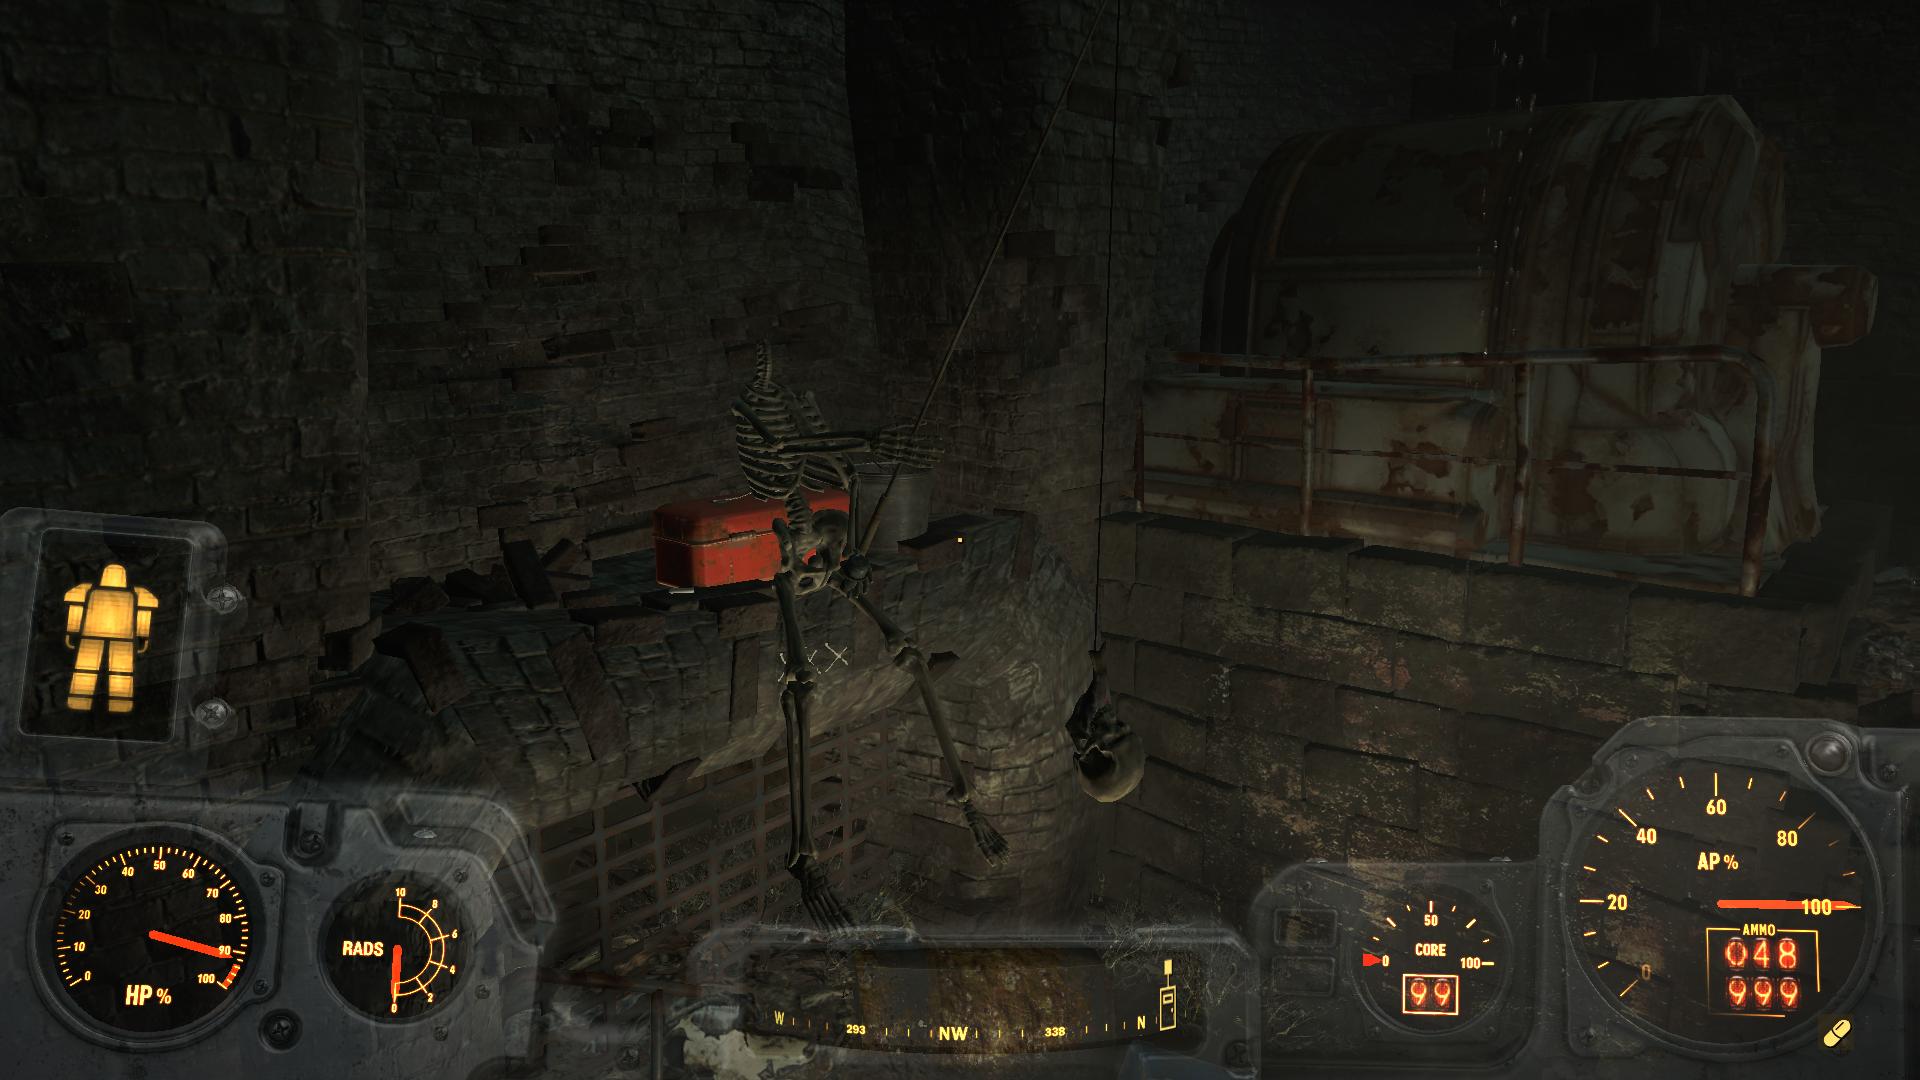 Рыбалка с умом - Fallout 4 череп, канализация возле Даймонд-сити